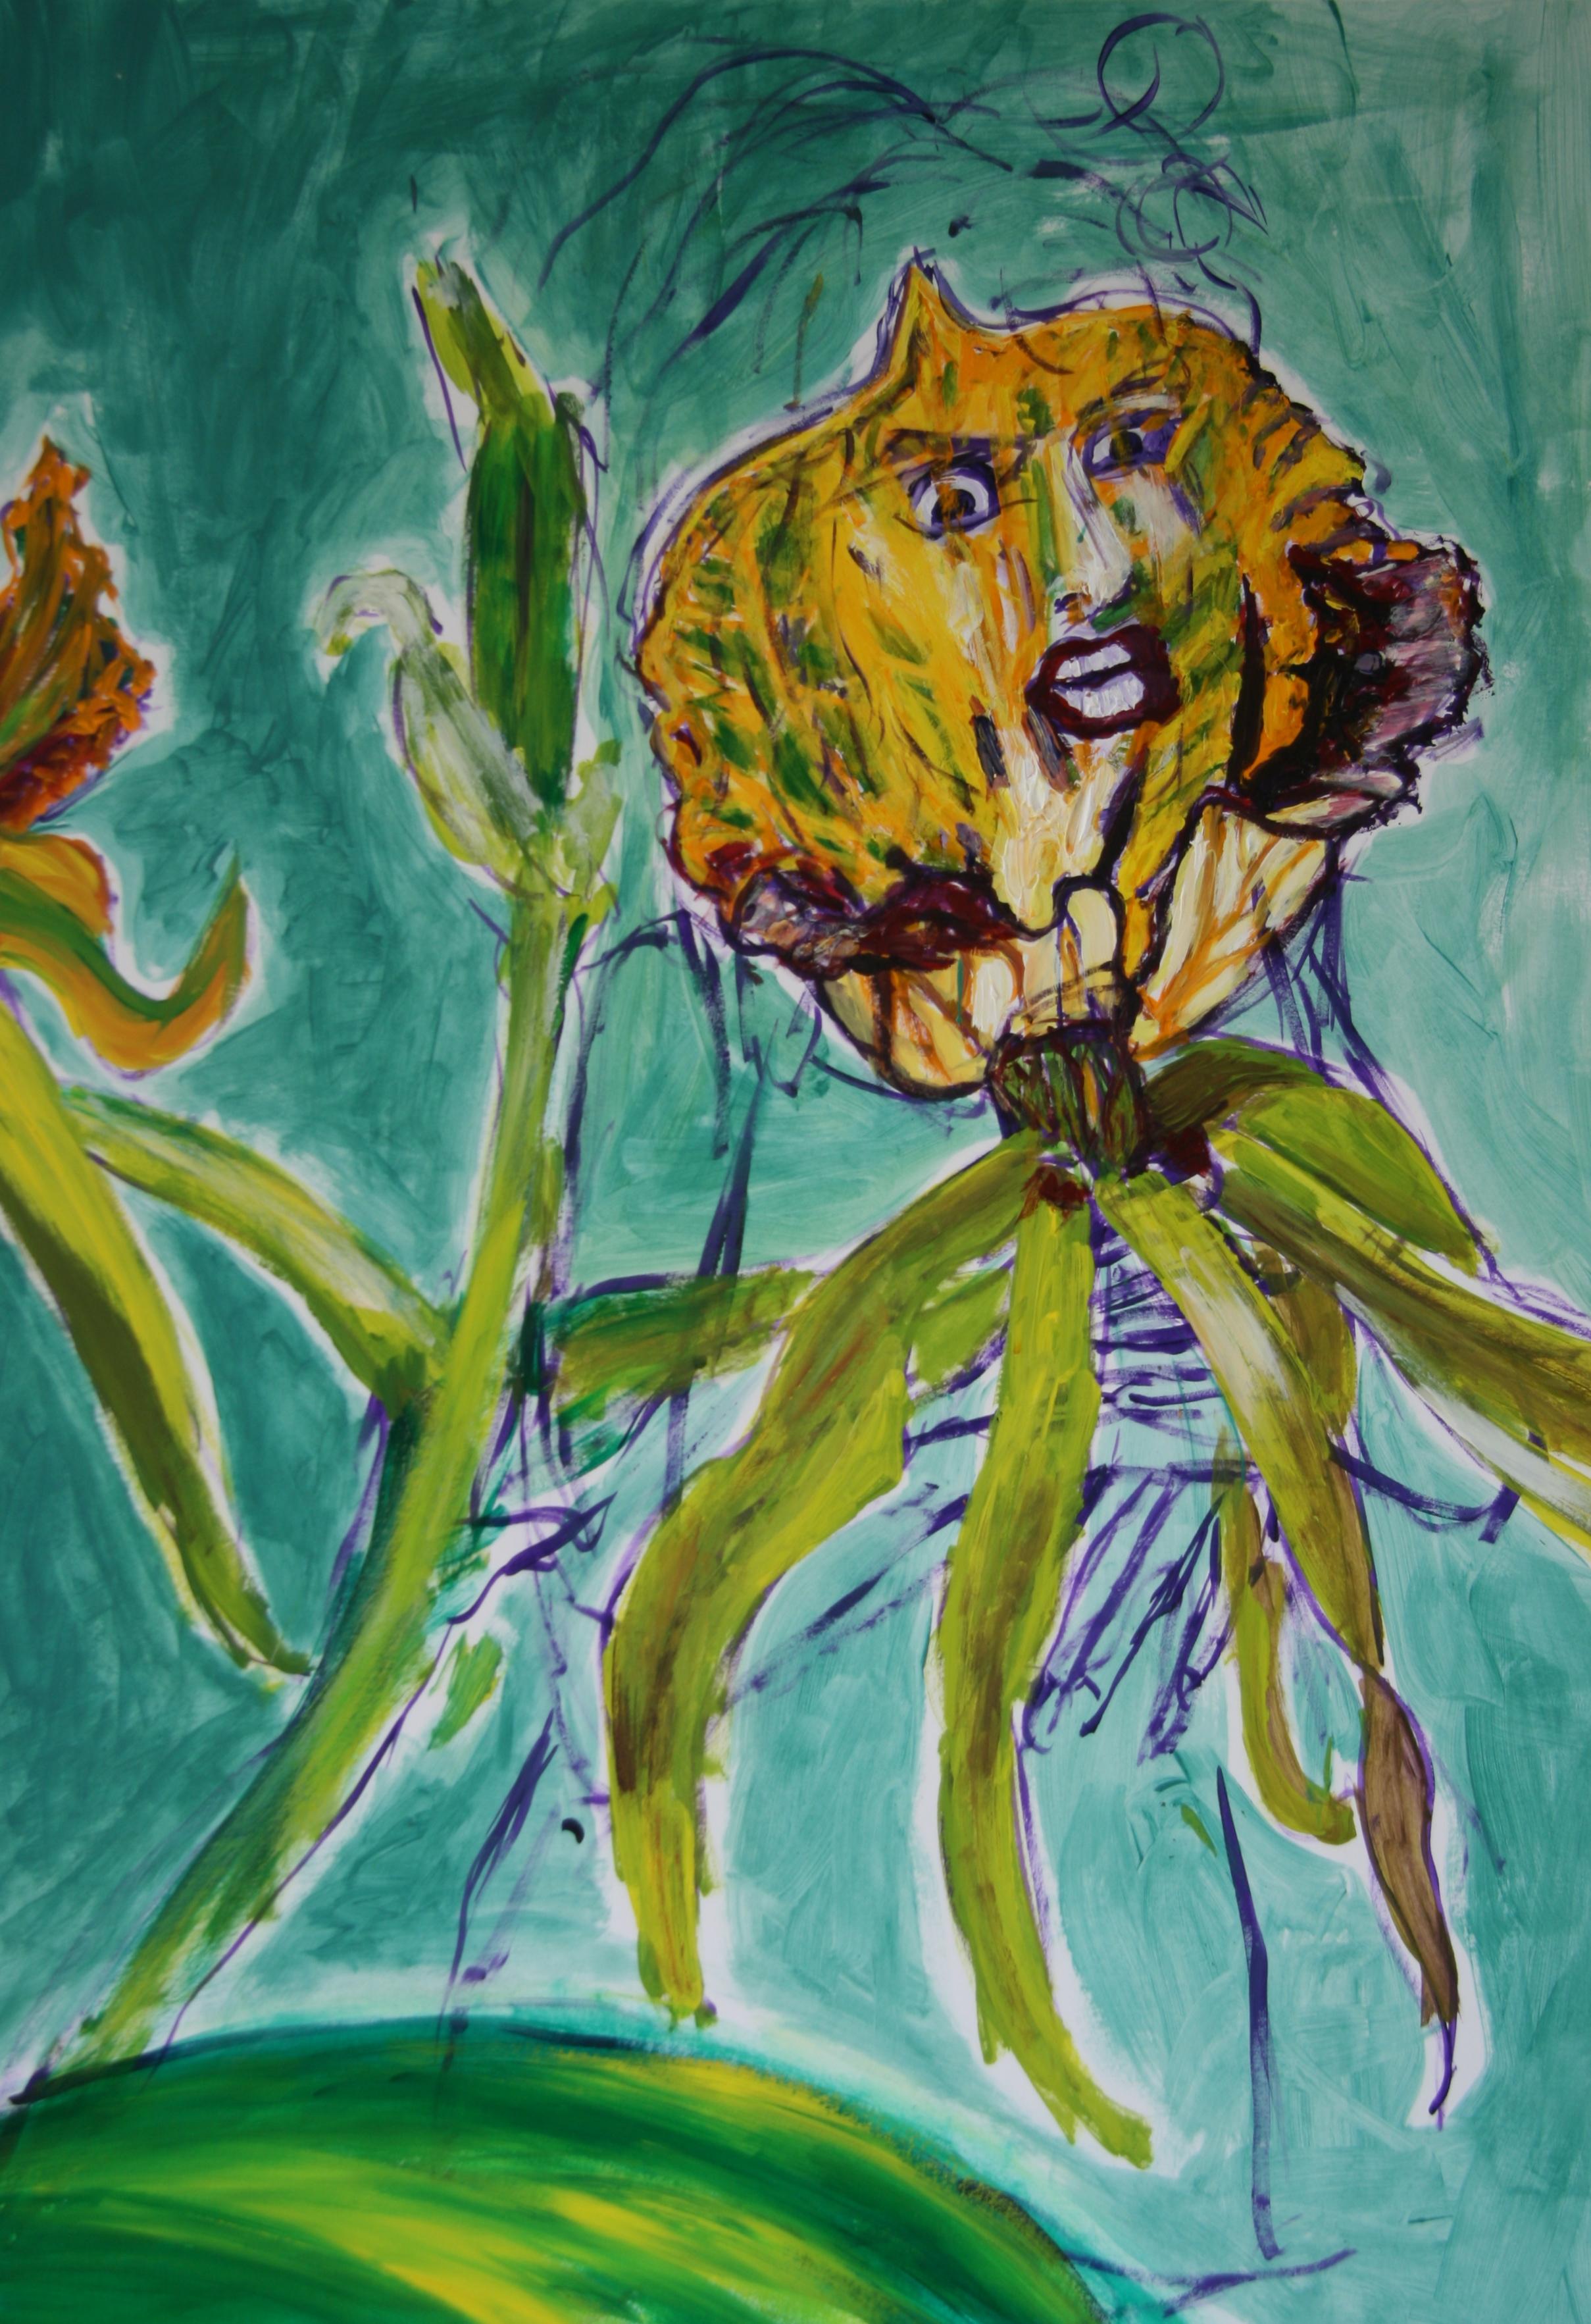 Die Begeisterte Blume 4, 100x70cm, acrylic on paper